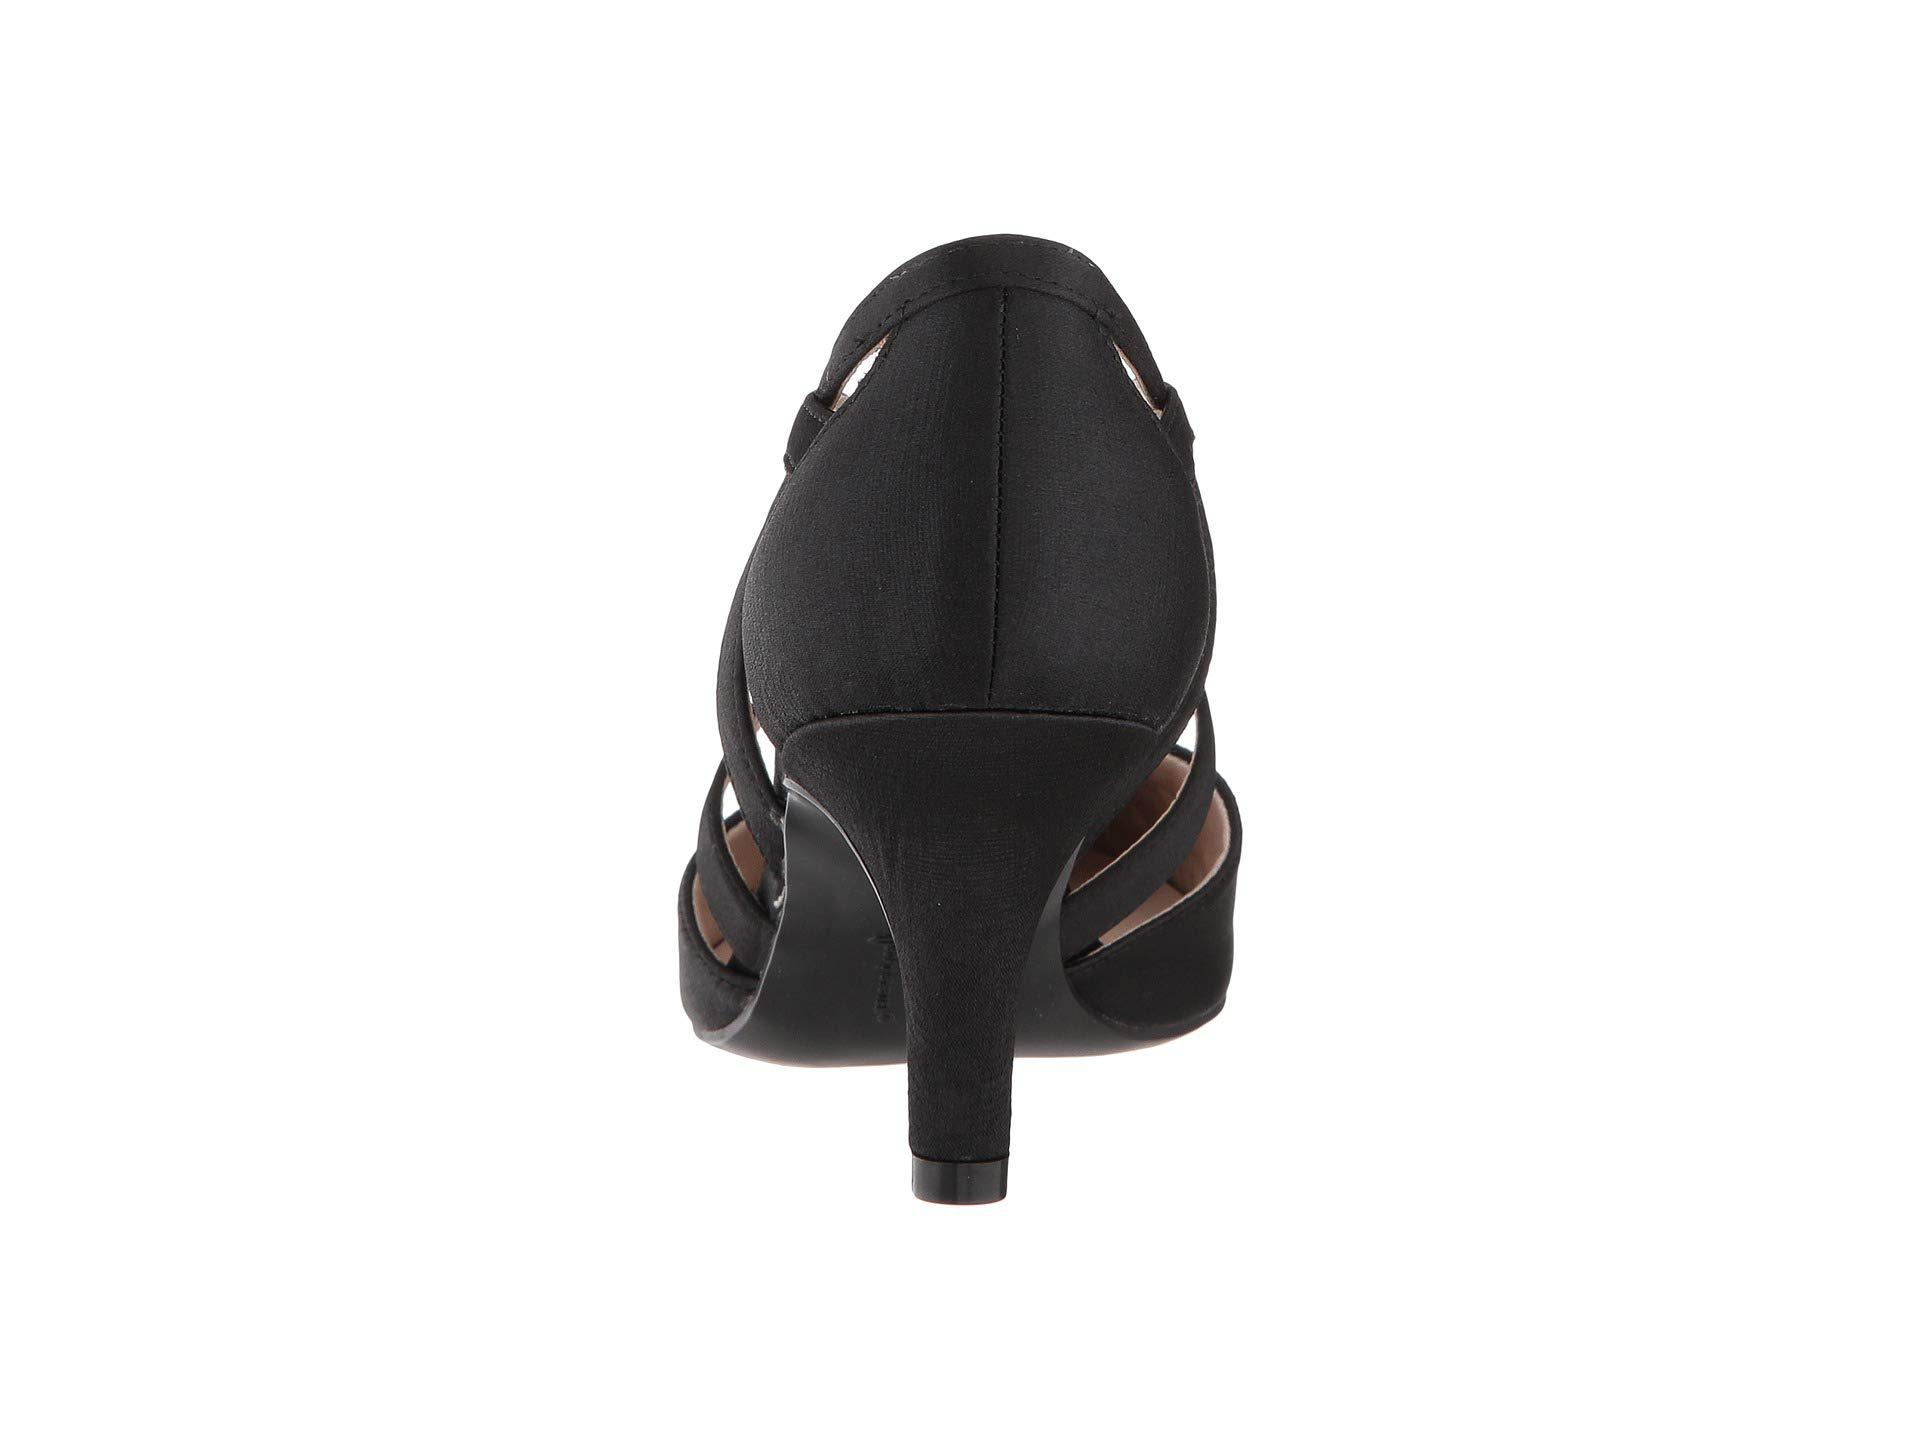 e96d039d716 LifeStride Seamless (white Vinci) High Heels in Black - Lyst